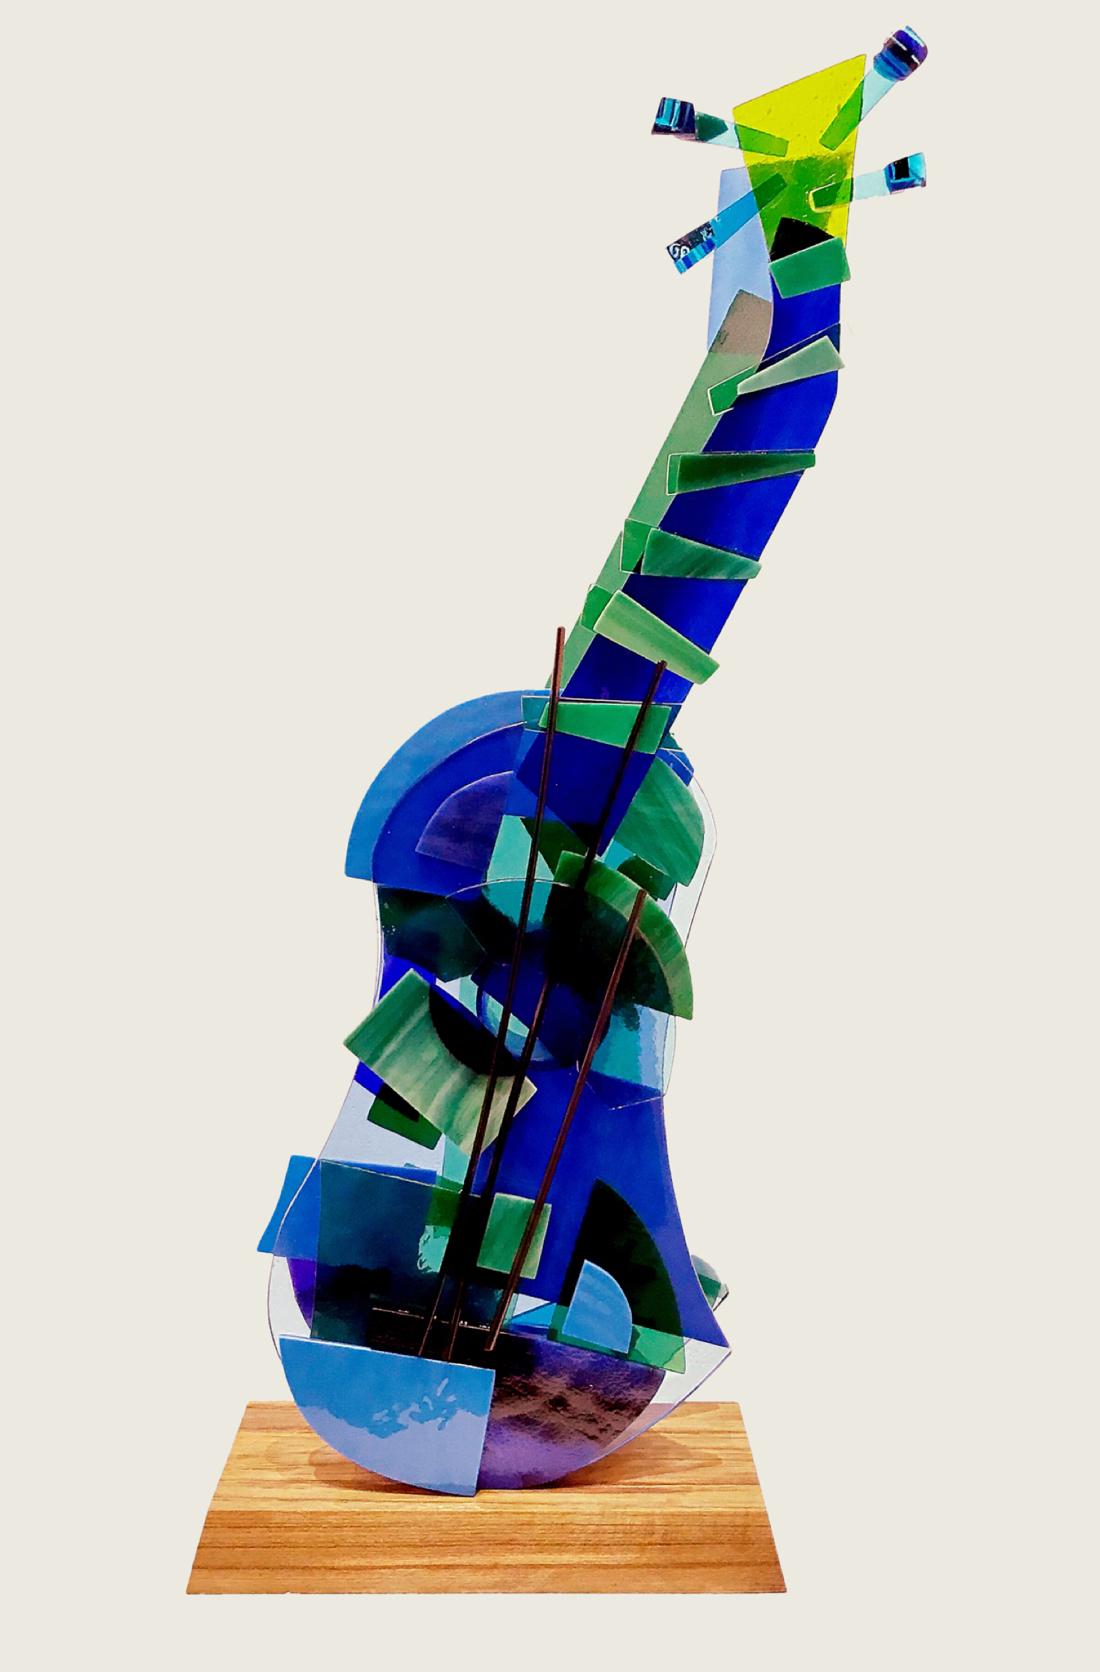 Derwin Leiva_Musical Glass_Glass - Cold Fabrication_30x10x2.5_20,000.jpg